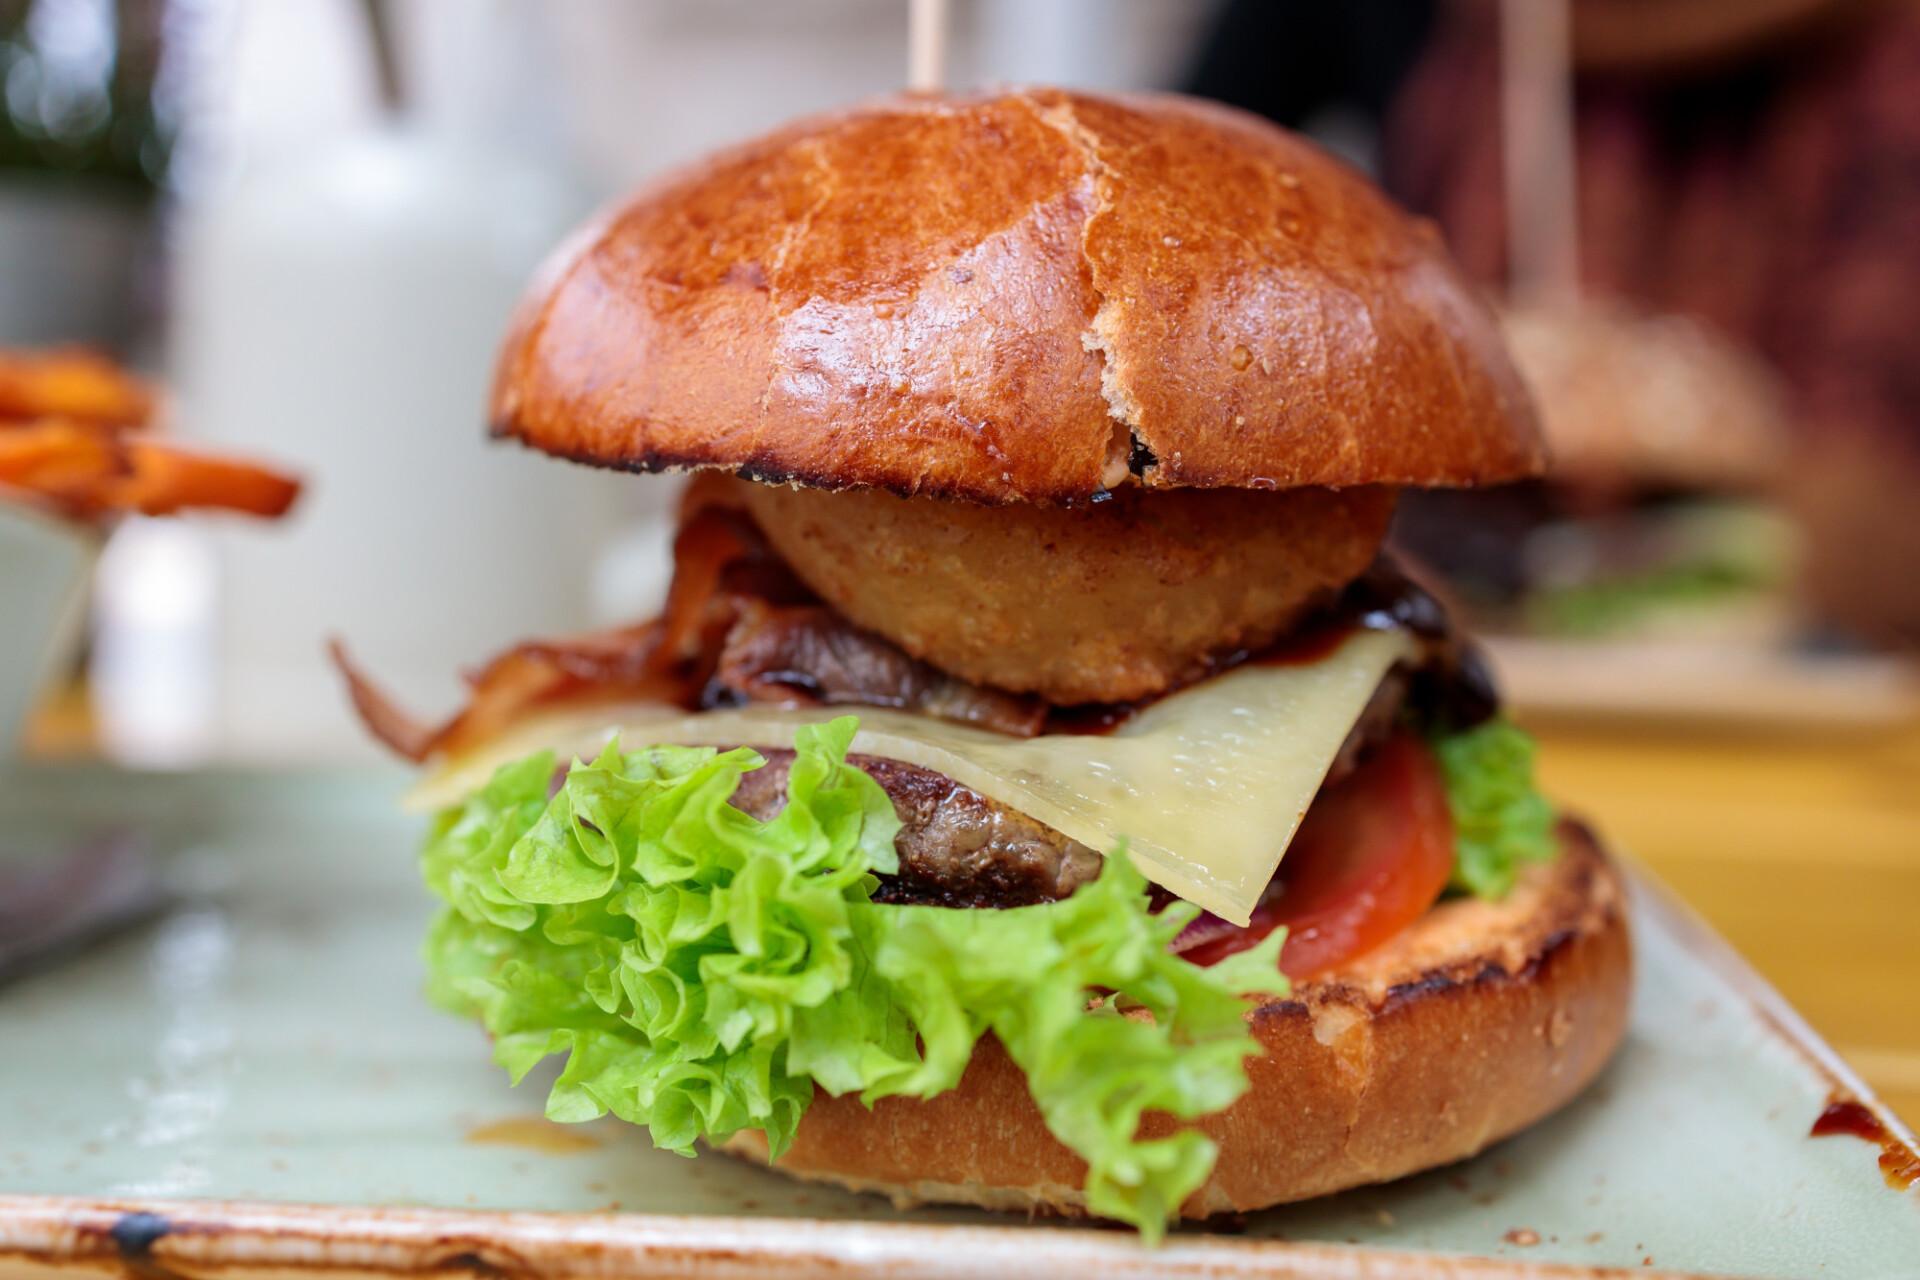 Hamburger with brioche bun